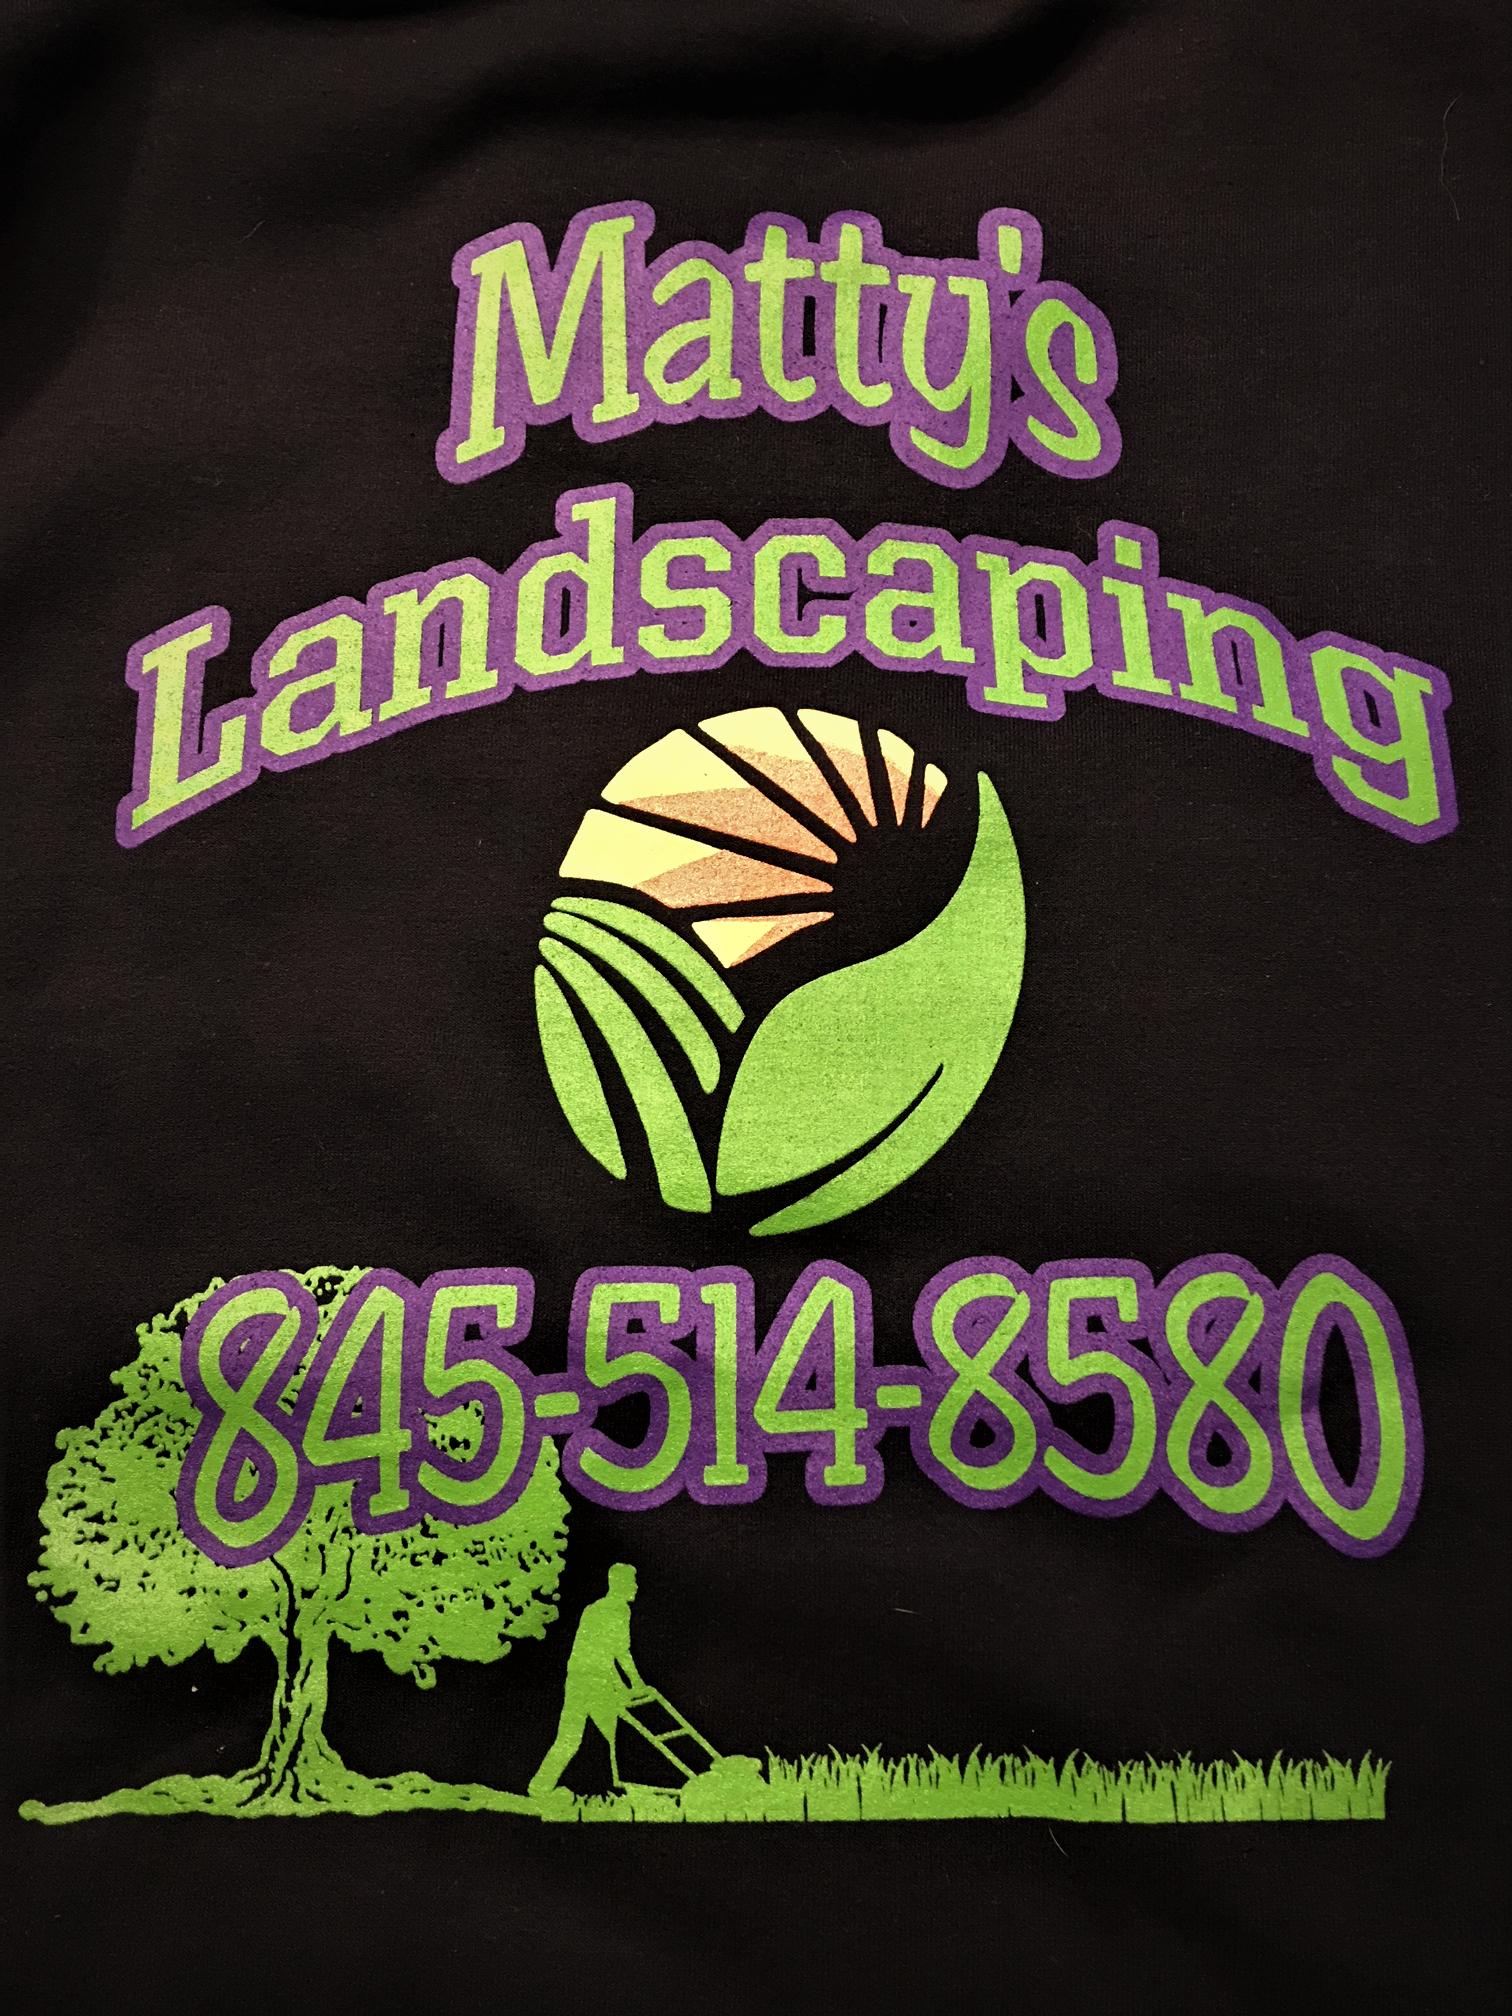 Mattys_logo_(2) Driveway repair, Fall clean up, Cleaning